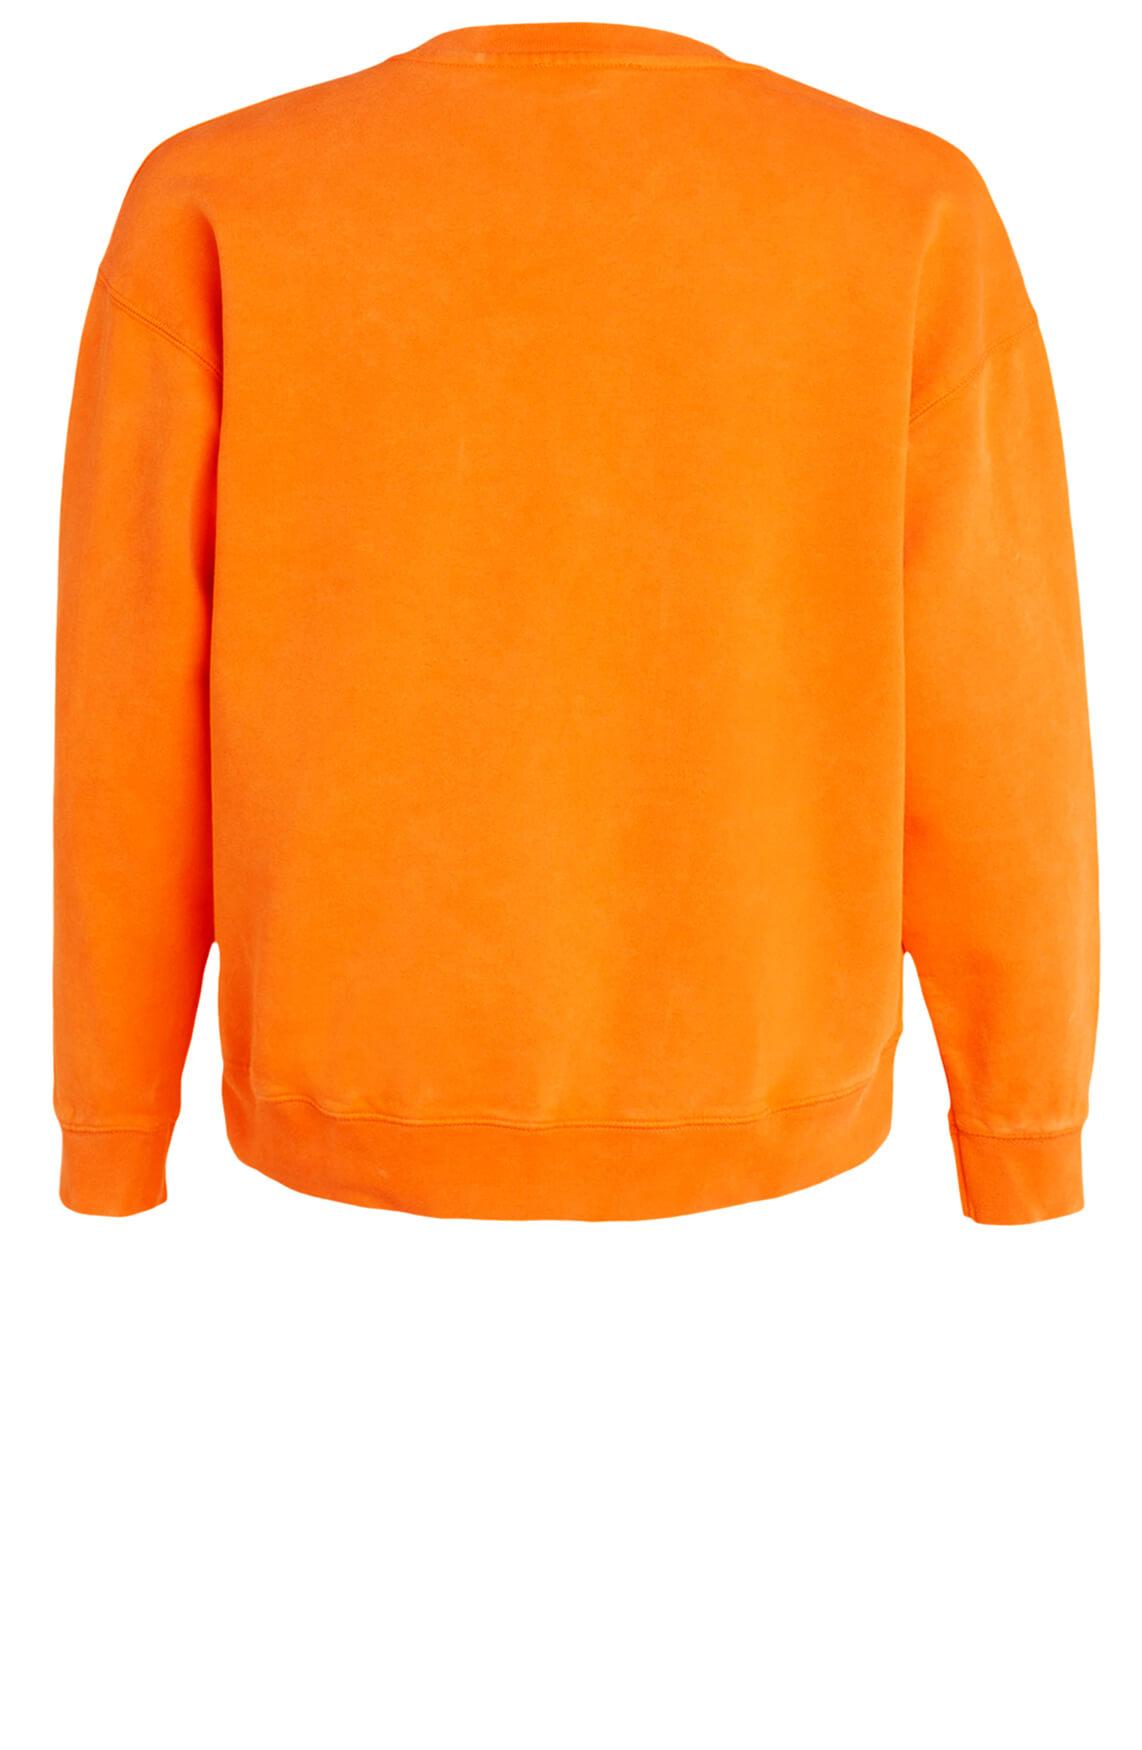 Alix The Label Dames Sweater met borduursel Oranje